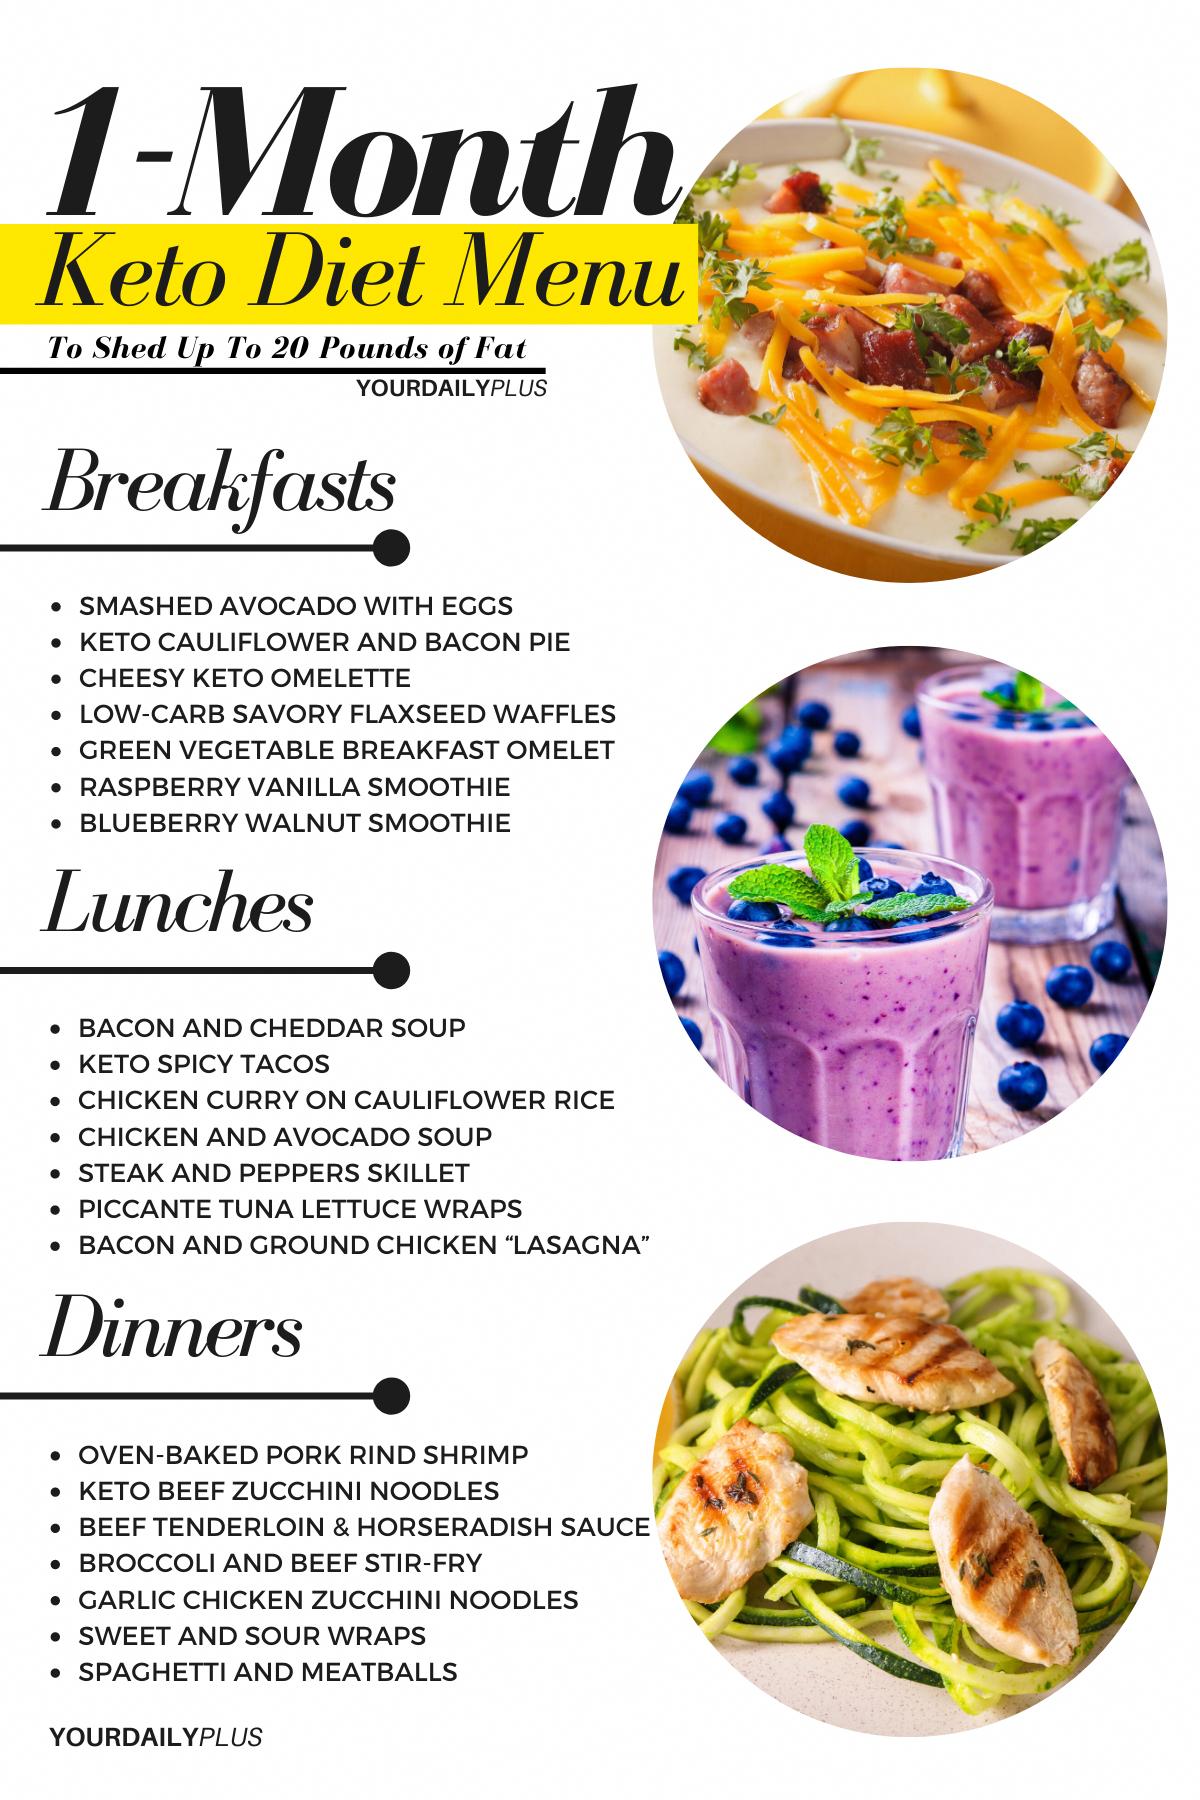 Keto Diet Menu 30 Day Keto Meal Plan For Beginners Ketodietmenu Keto Diet Menu Keto Meal Plan Keto Diet